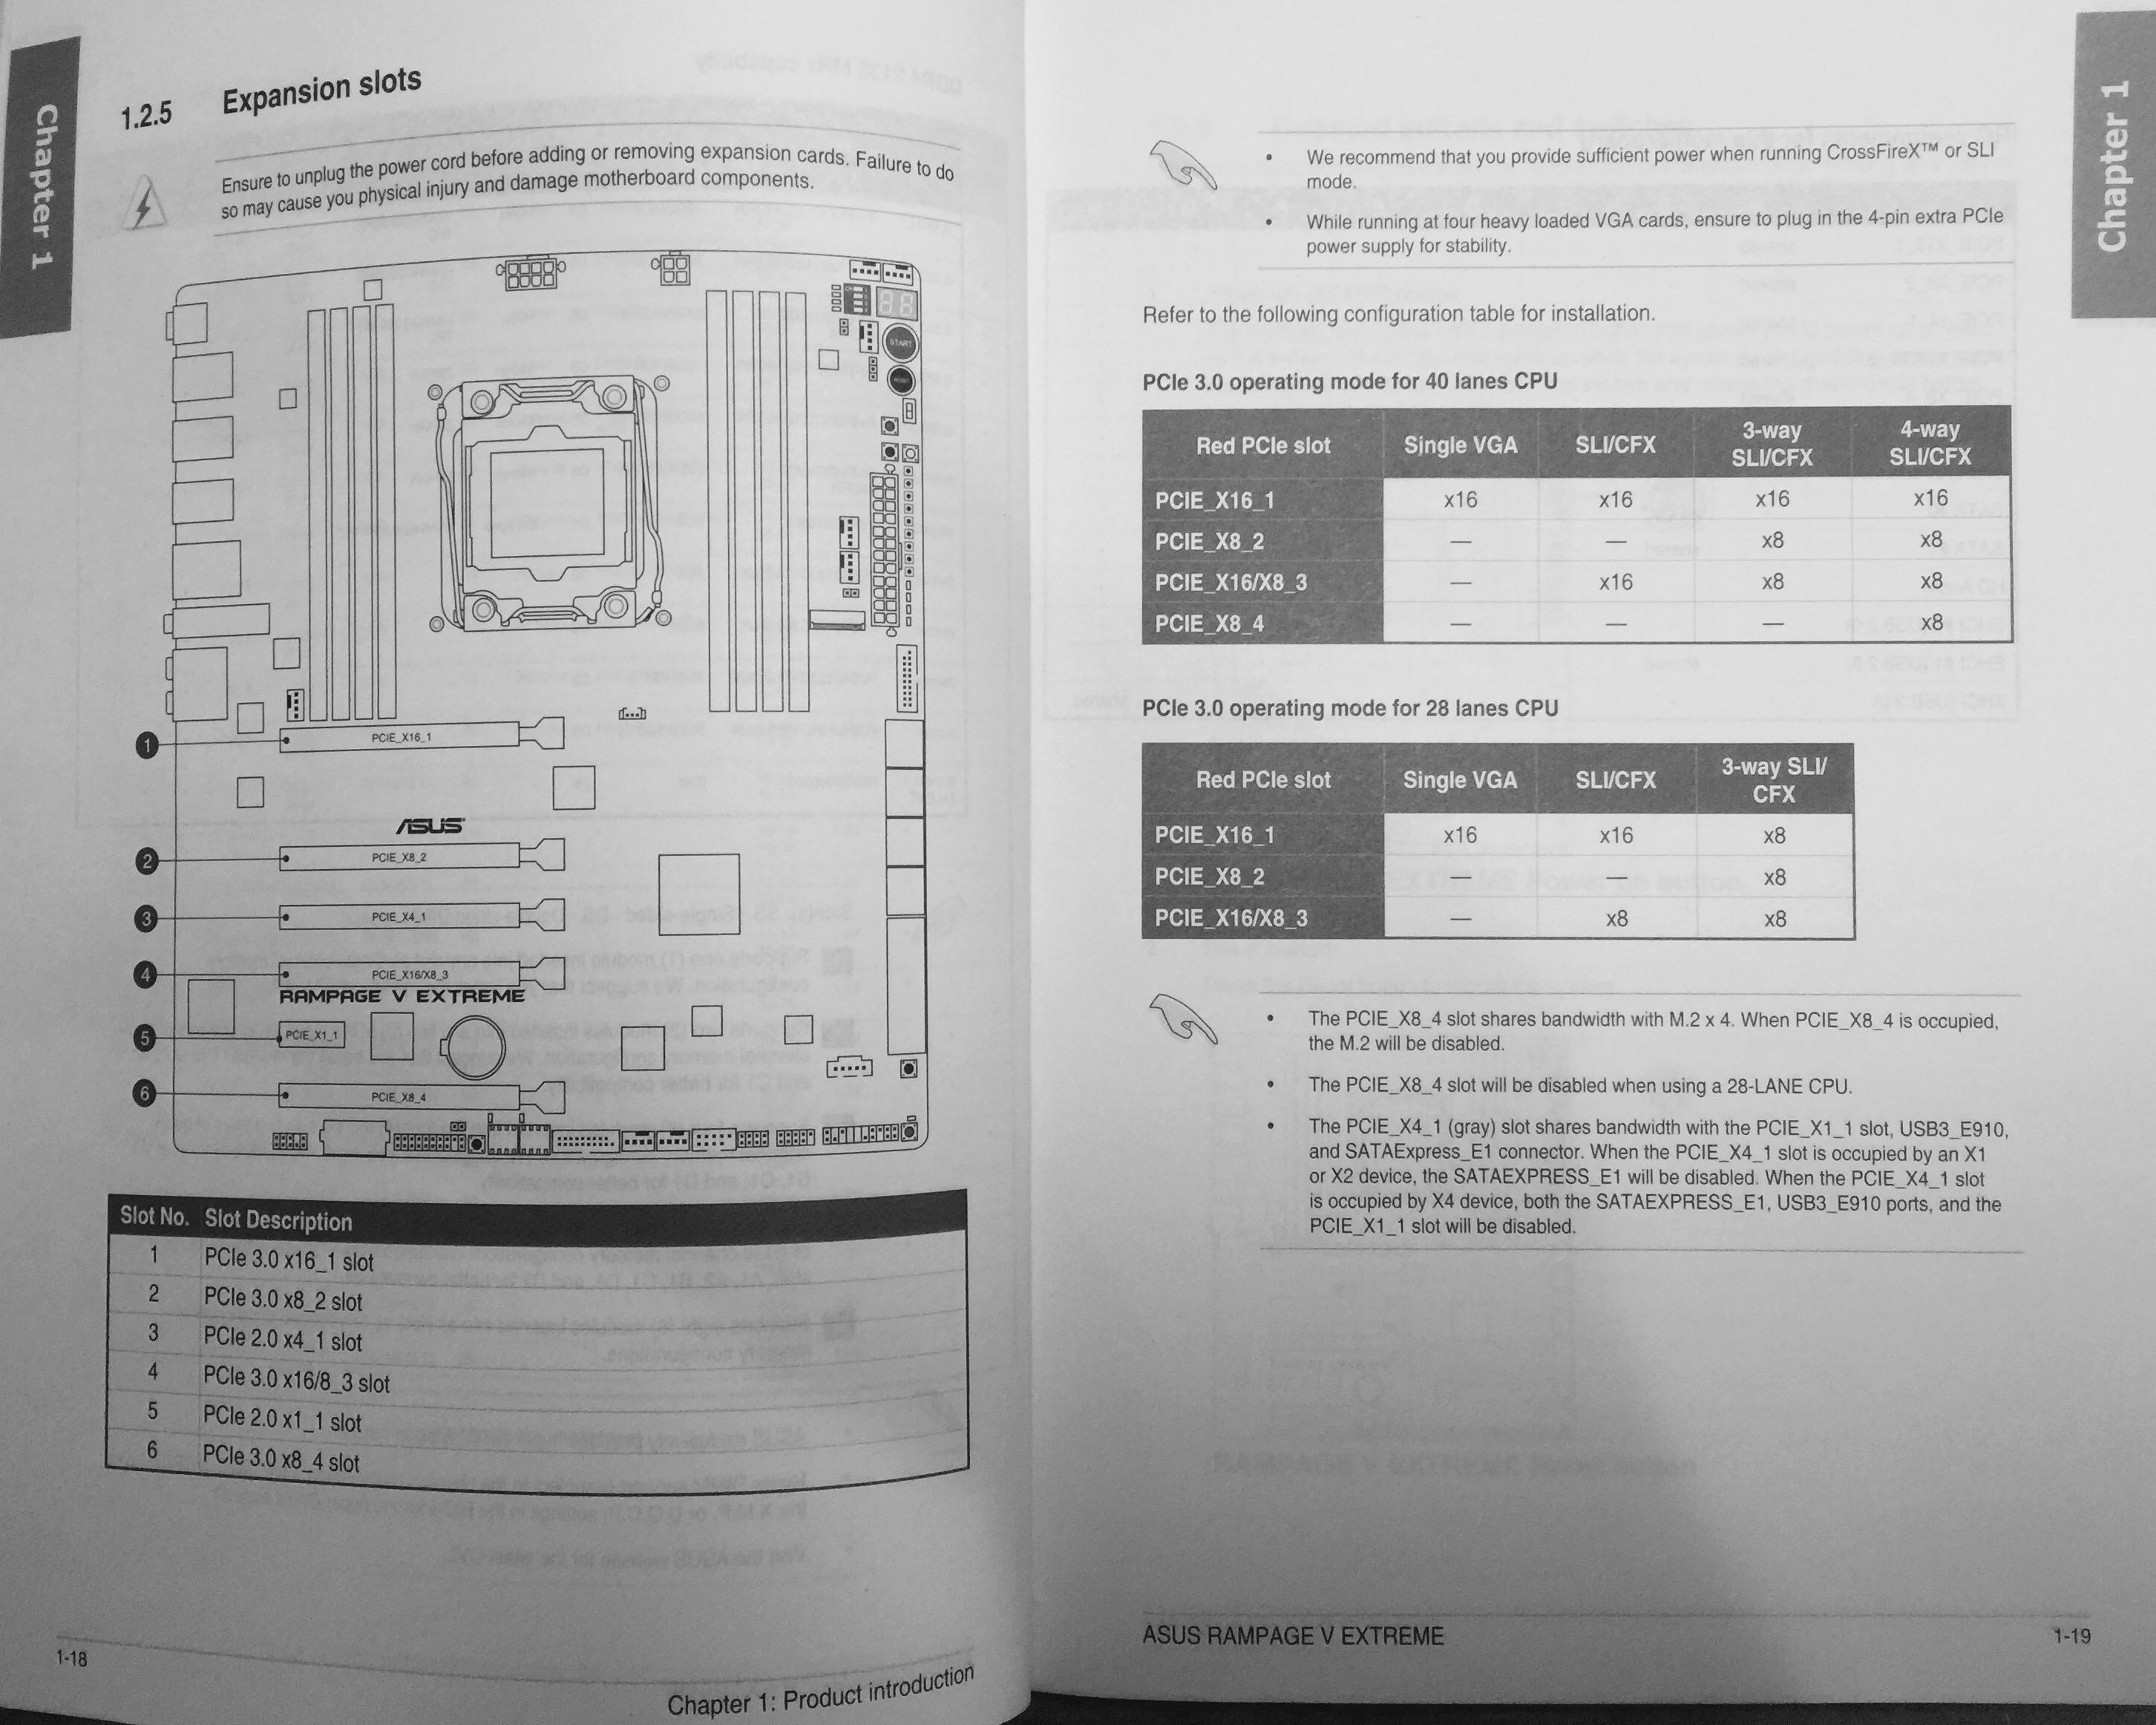 cooler master hyper 212 evo manual pdf